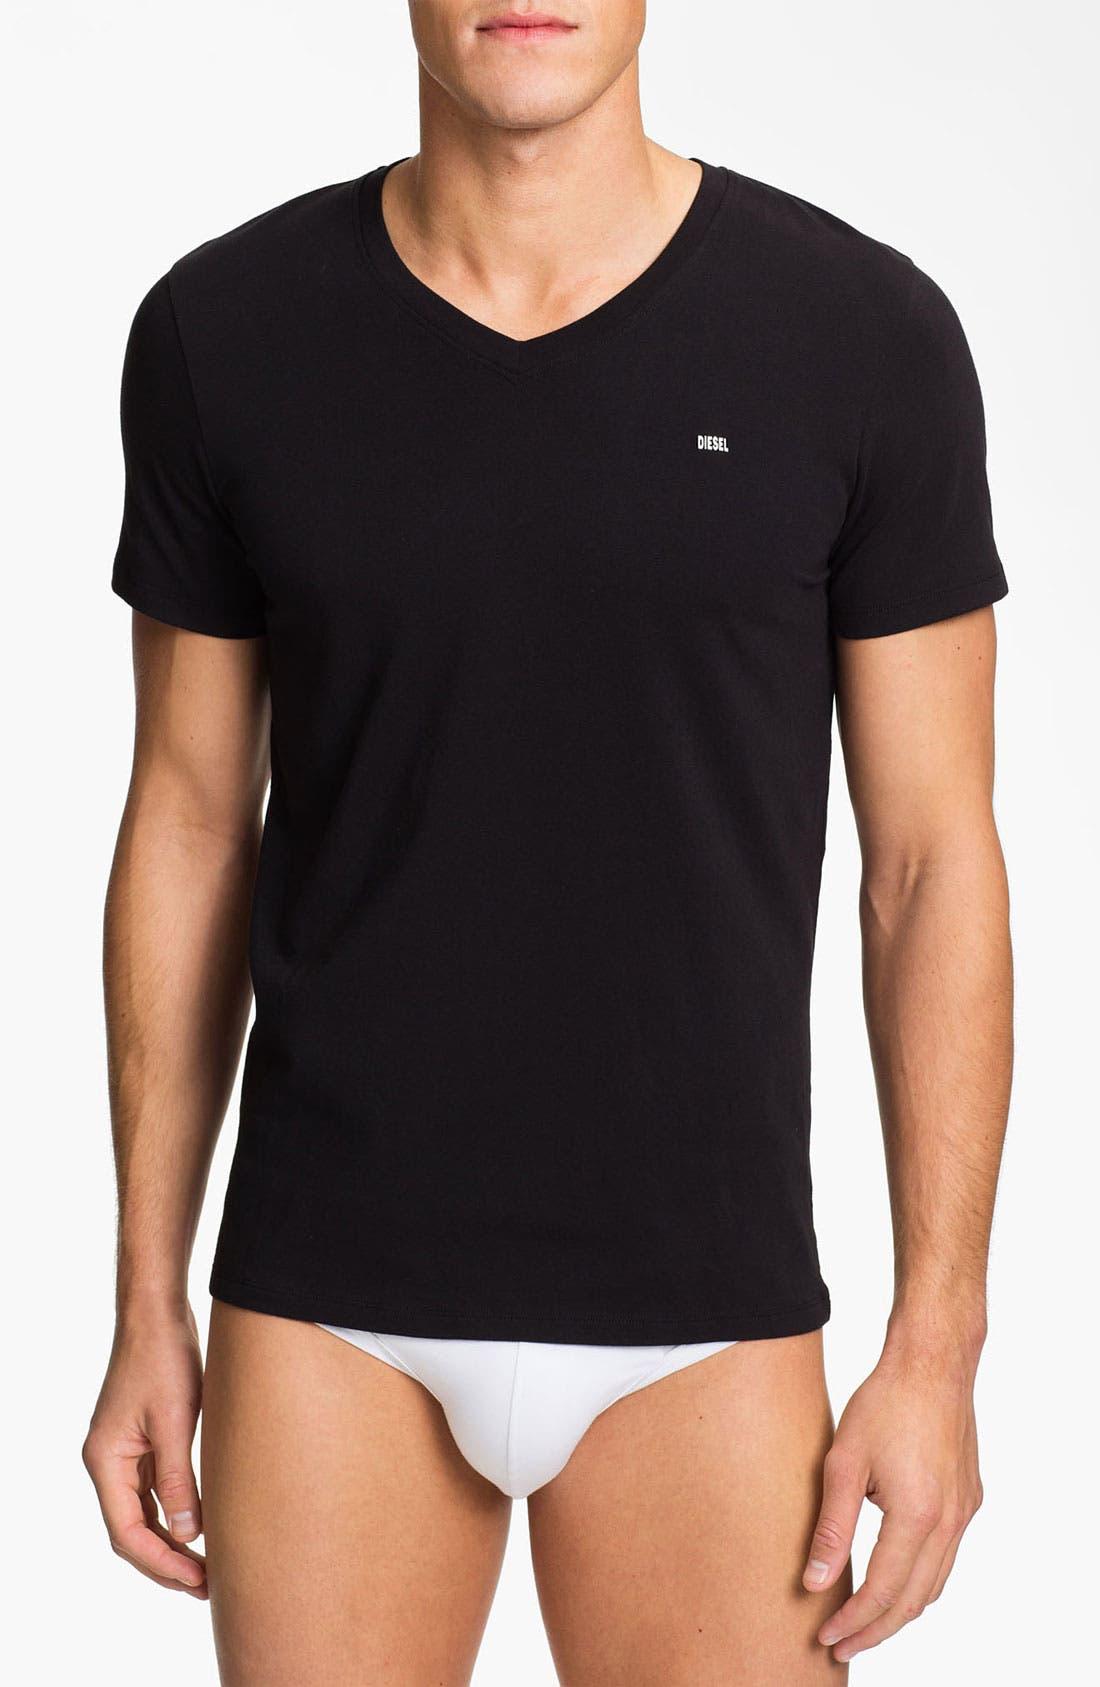 Main Image - DIESEL® 'Michael' V-Neck T-Shirt